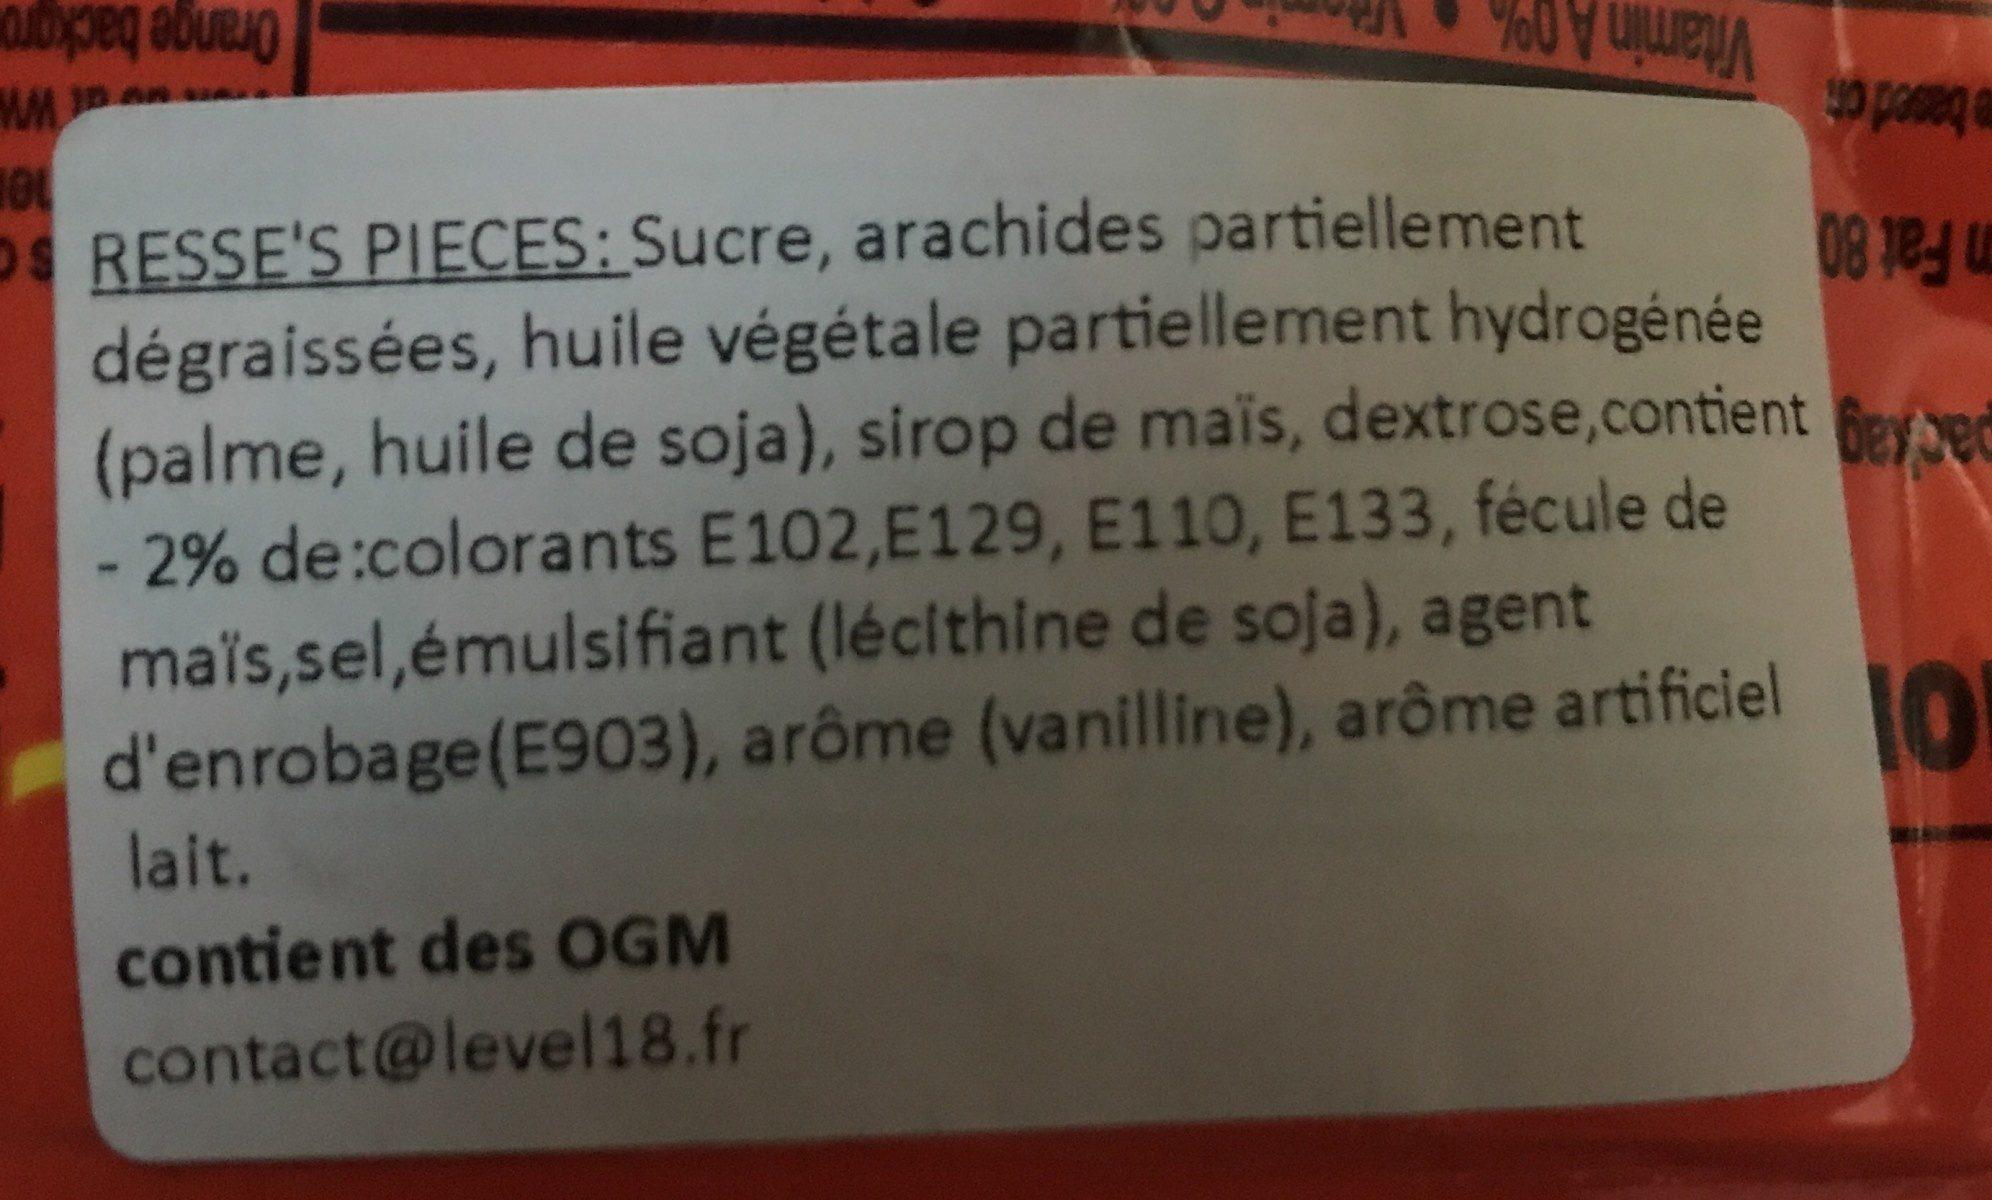 Reese's Pieces - Ingredients